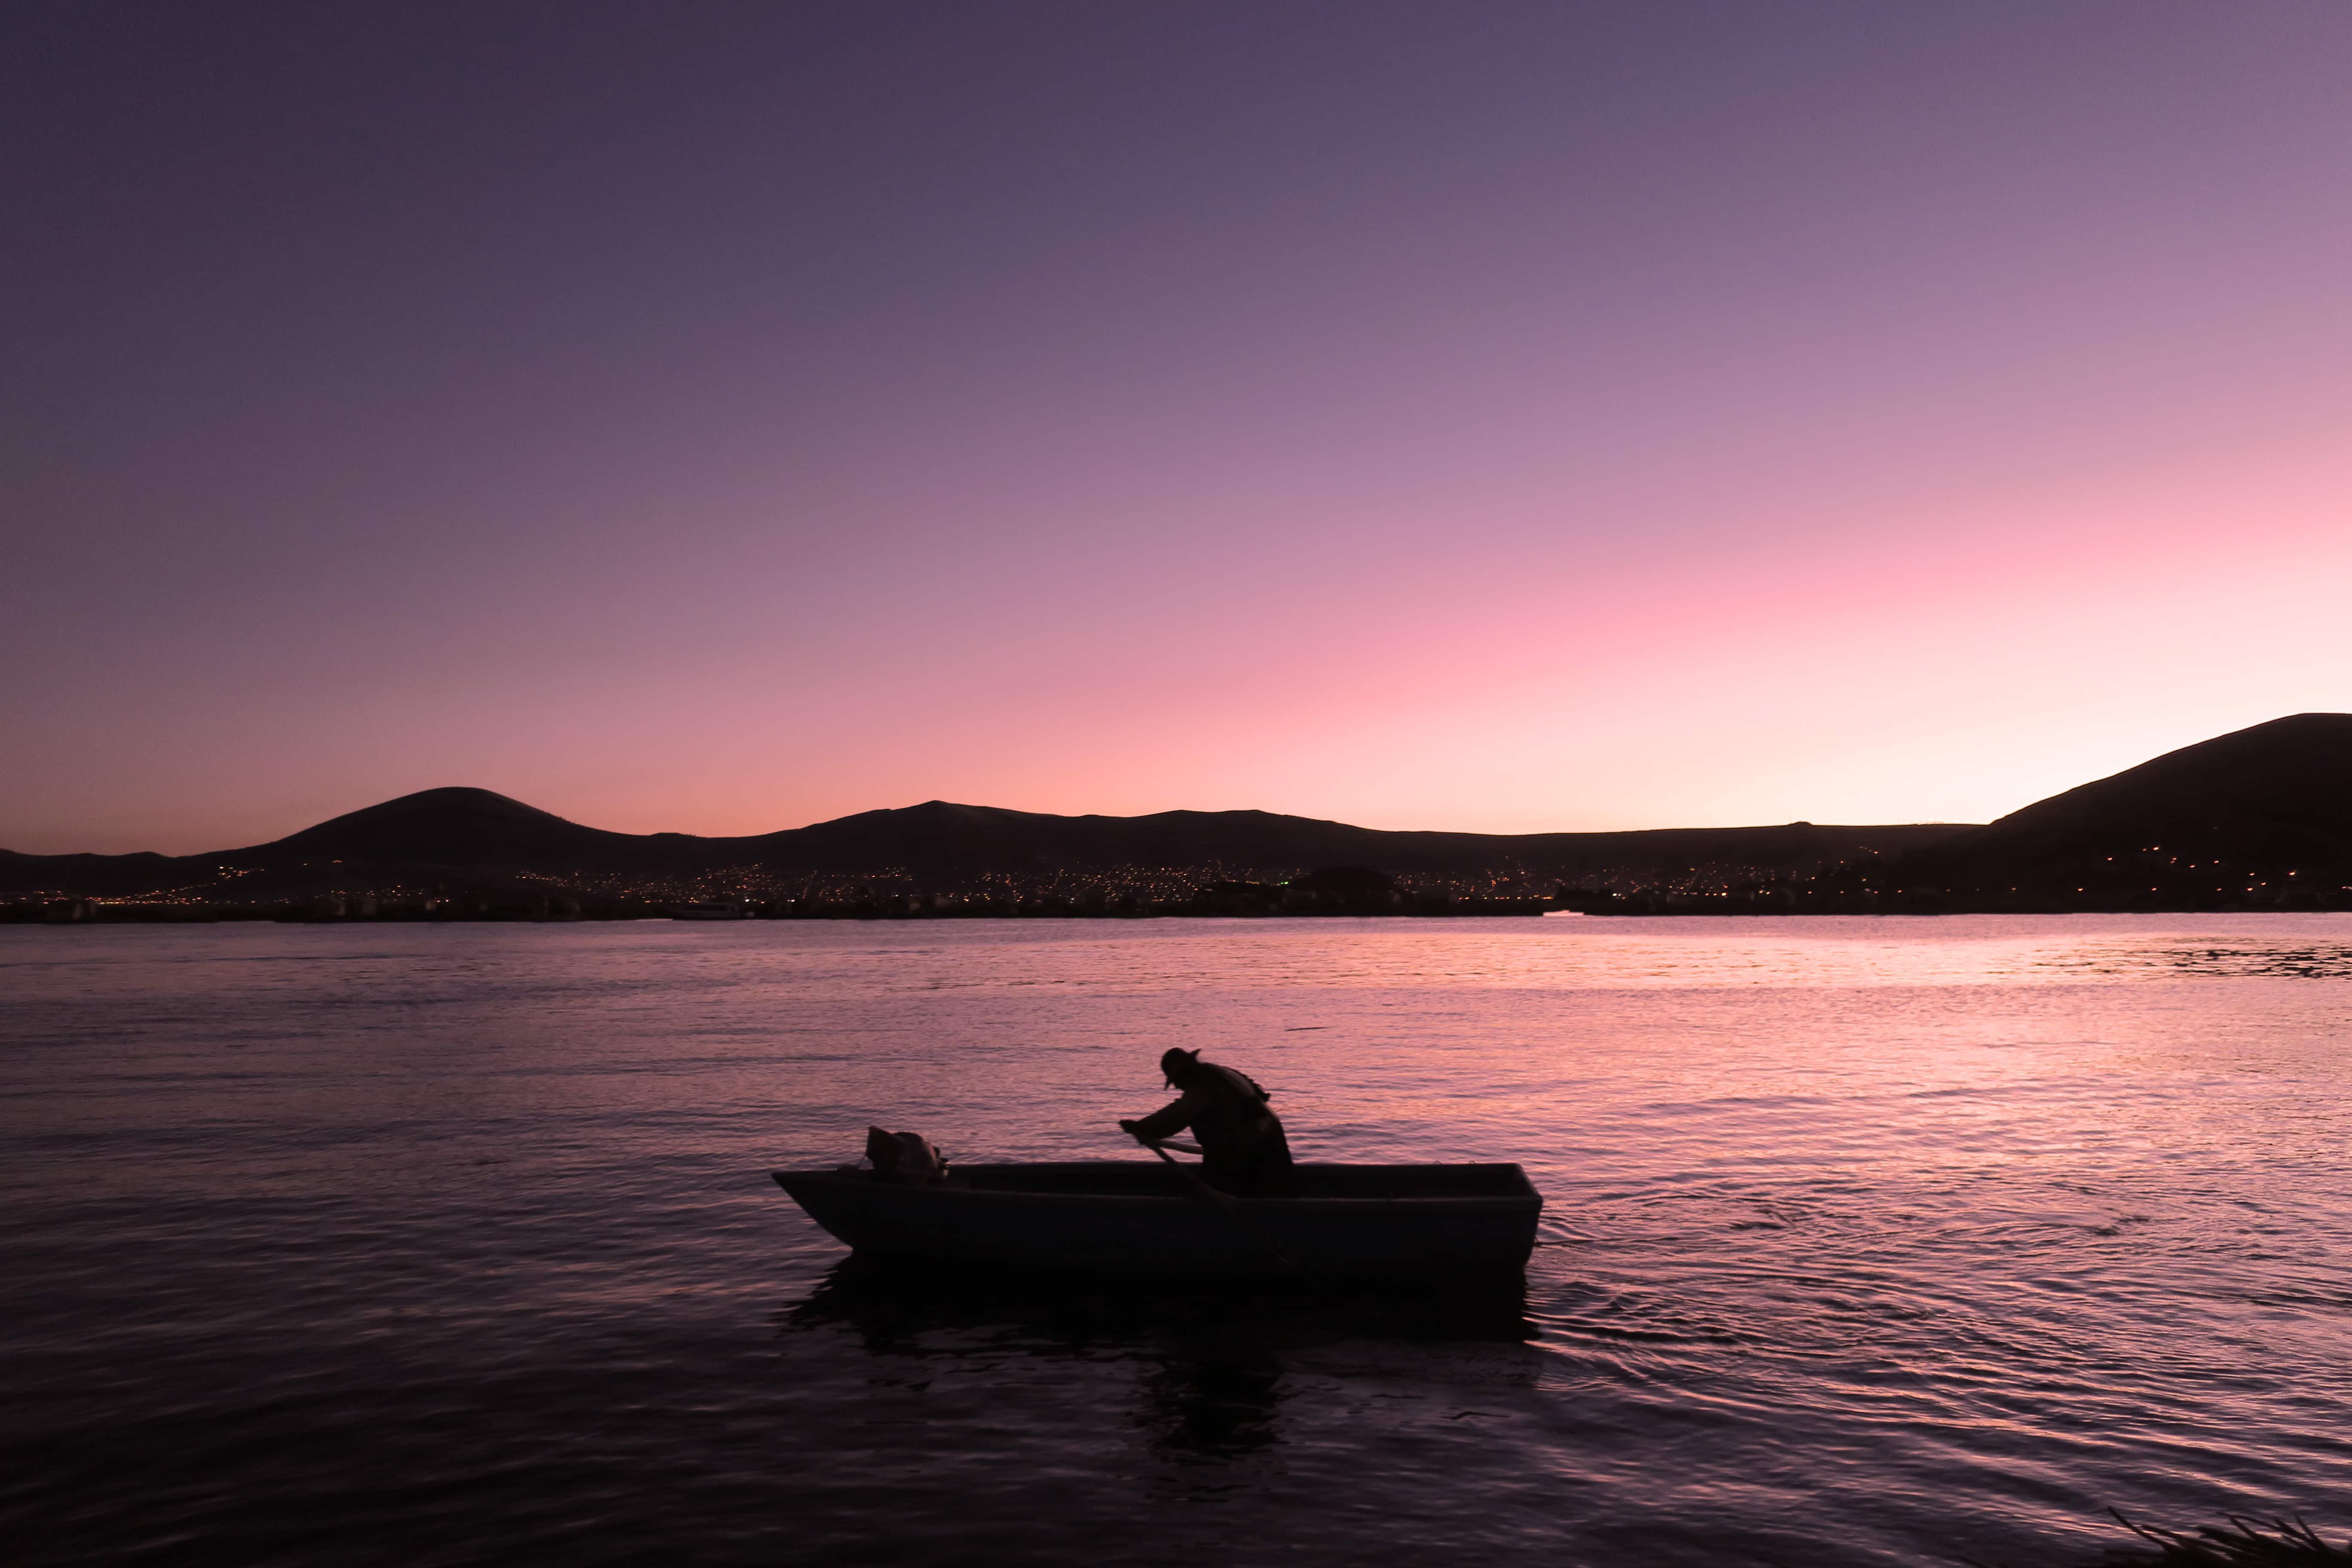 Sunset at Titicaca Lake.